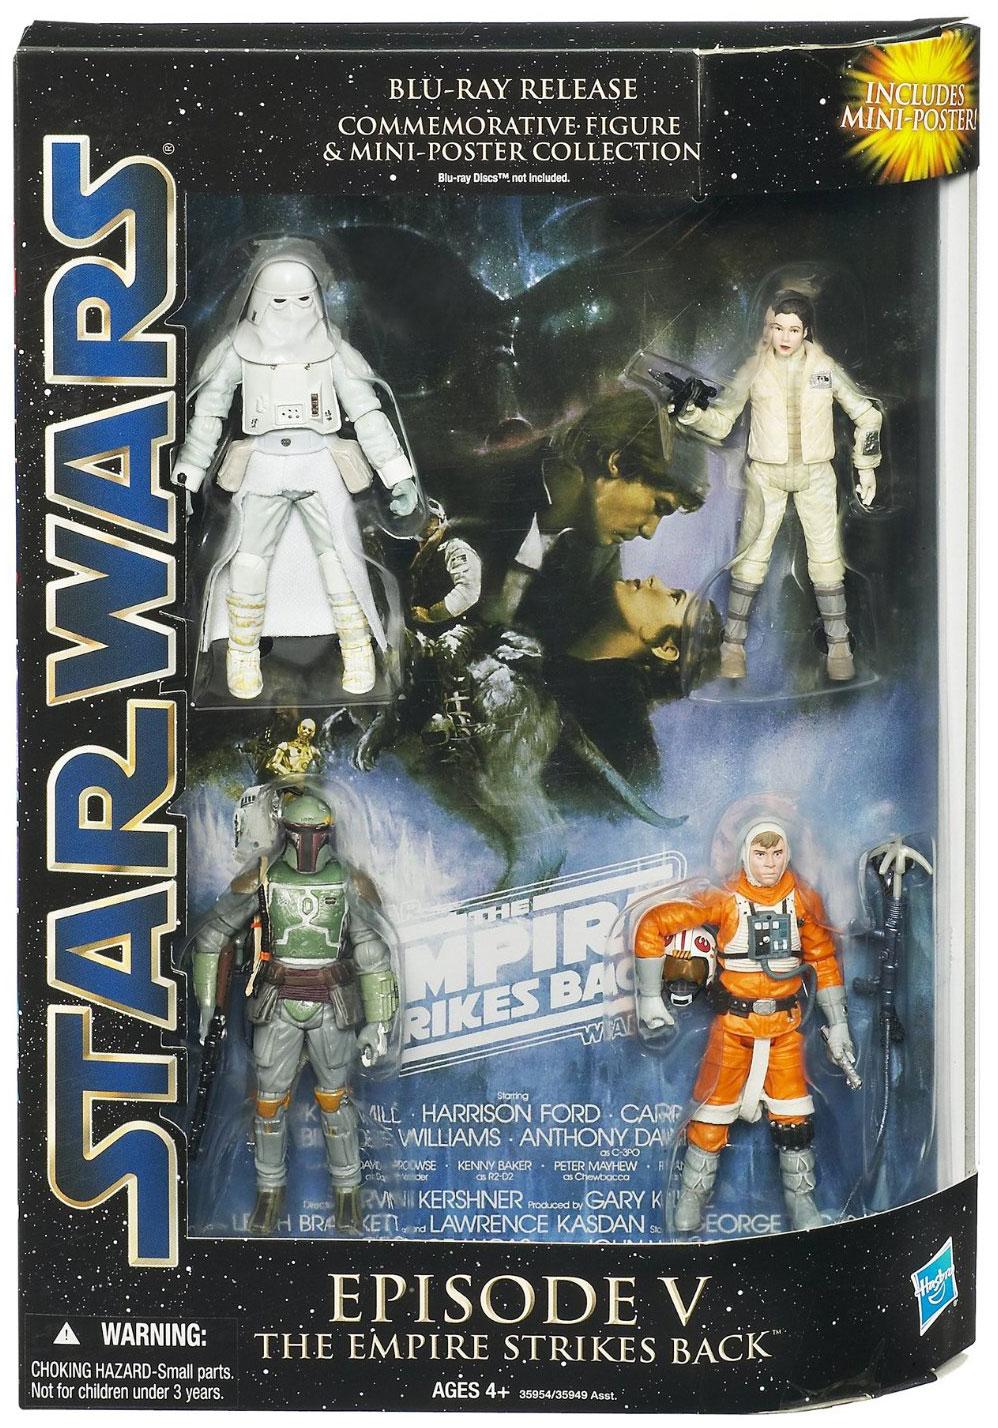 Episode V: The Empire Strikes Back Blu-ray Release Commemorative Figure and Mini-Poster Collection (2011)